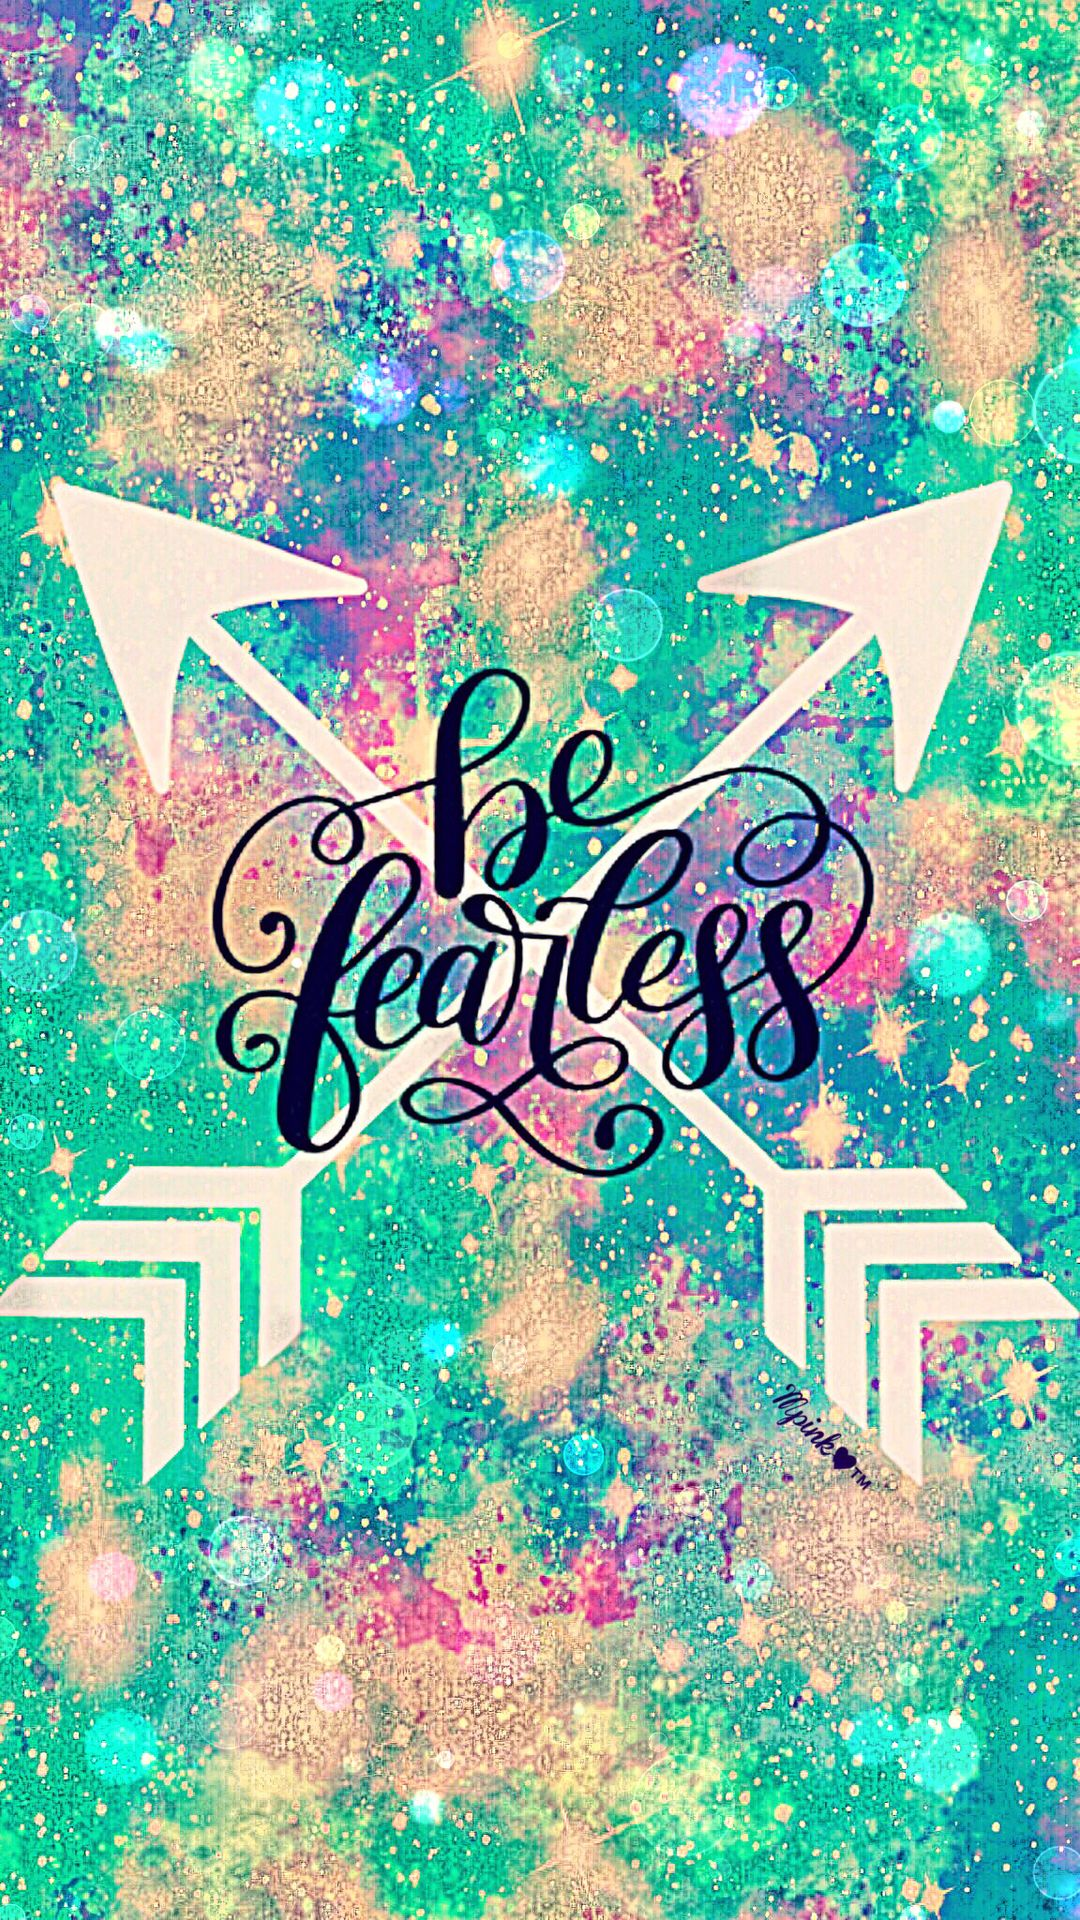 Be Fearless Galaxy Wallpaper androidwallpaper